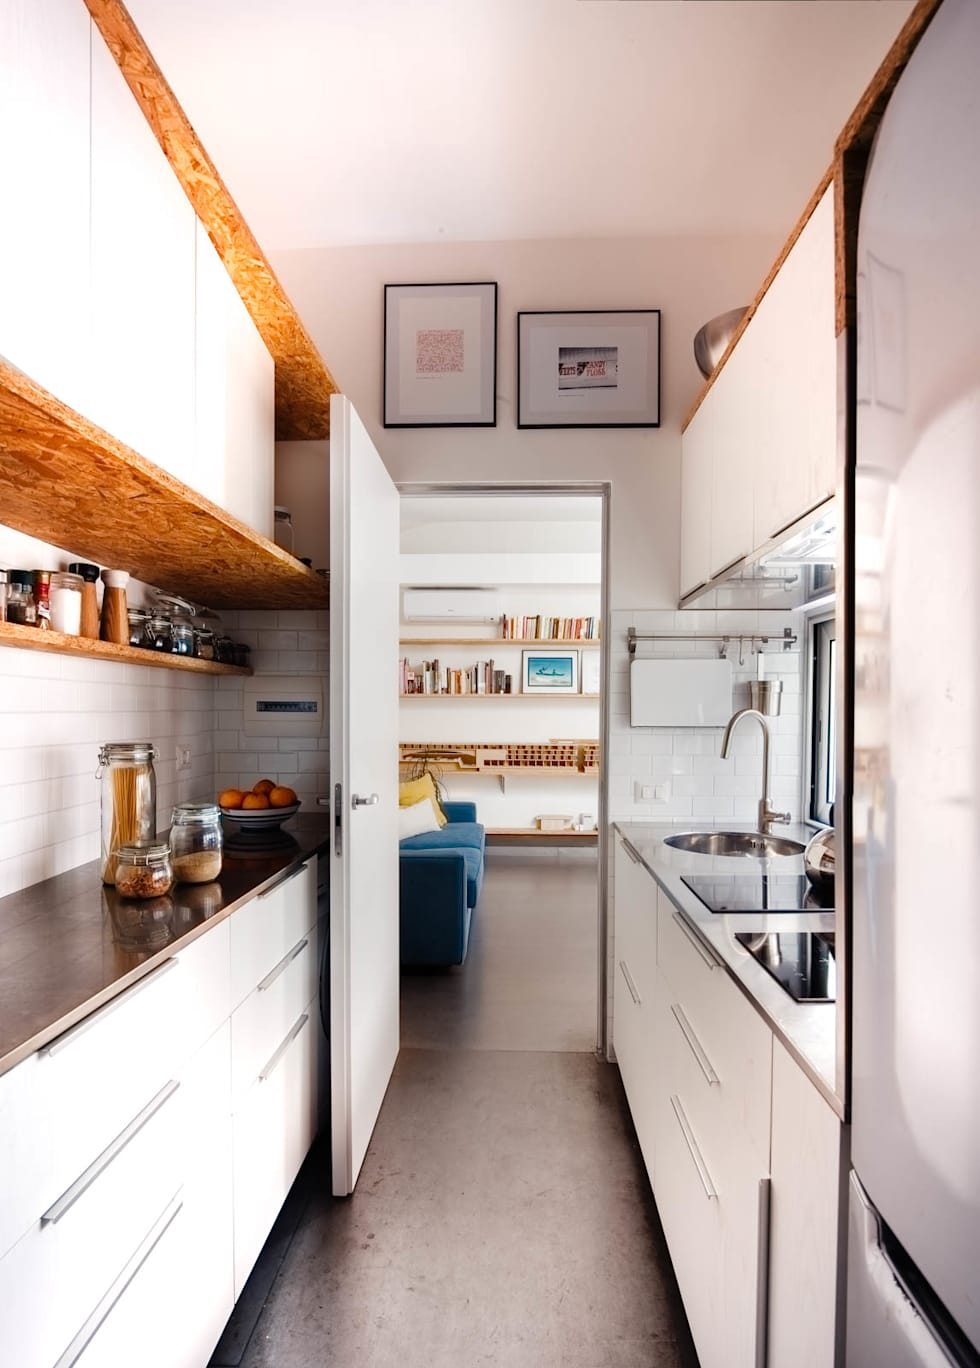 Cucina: Cucina attrezzata in stile  di manuarino architettura design comunicazione